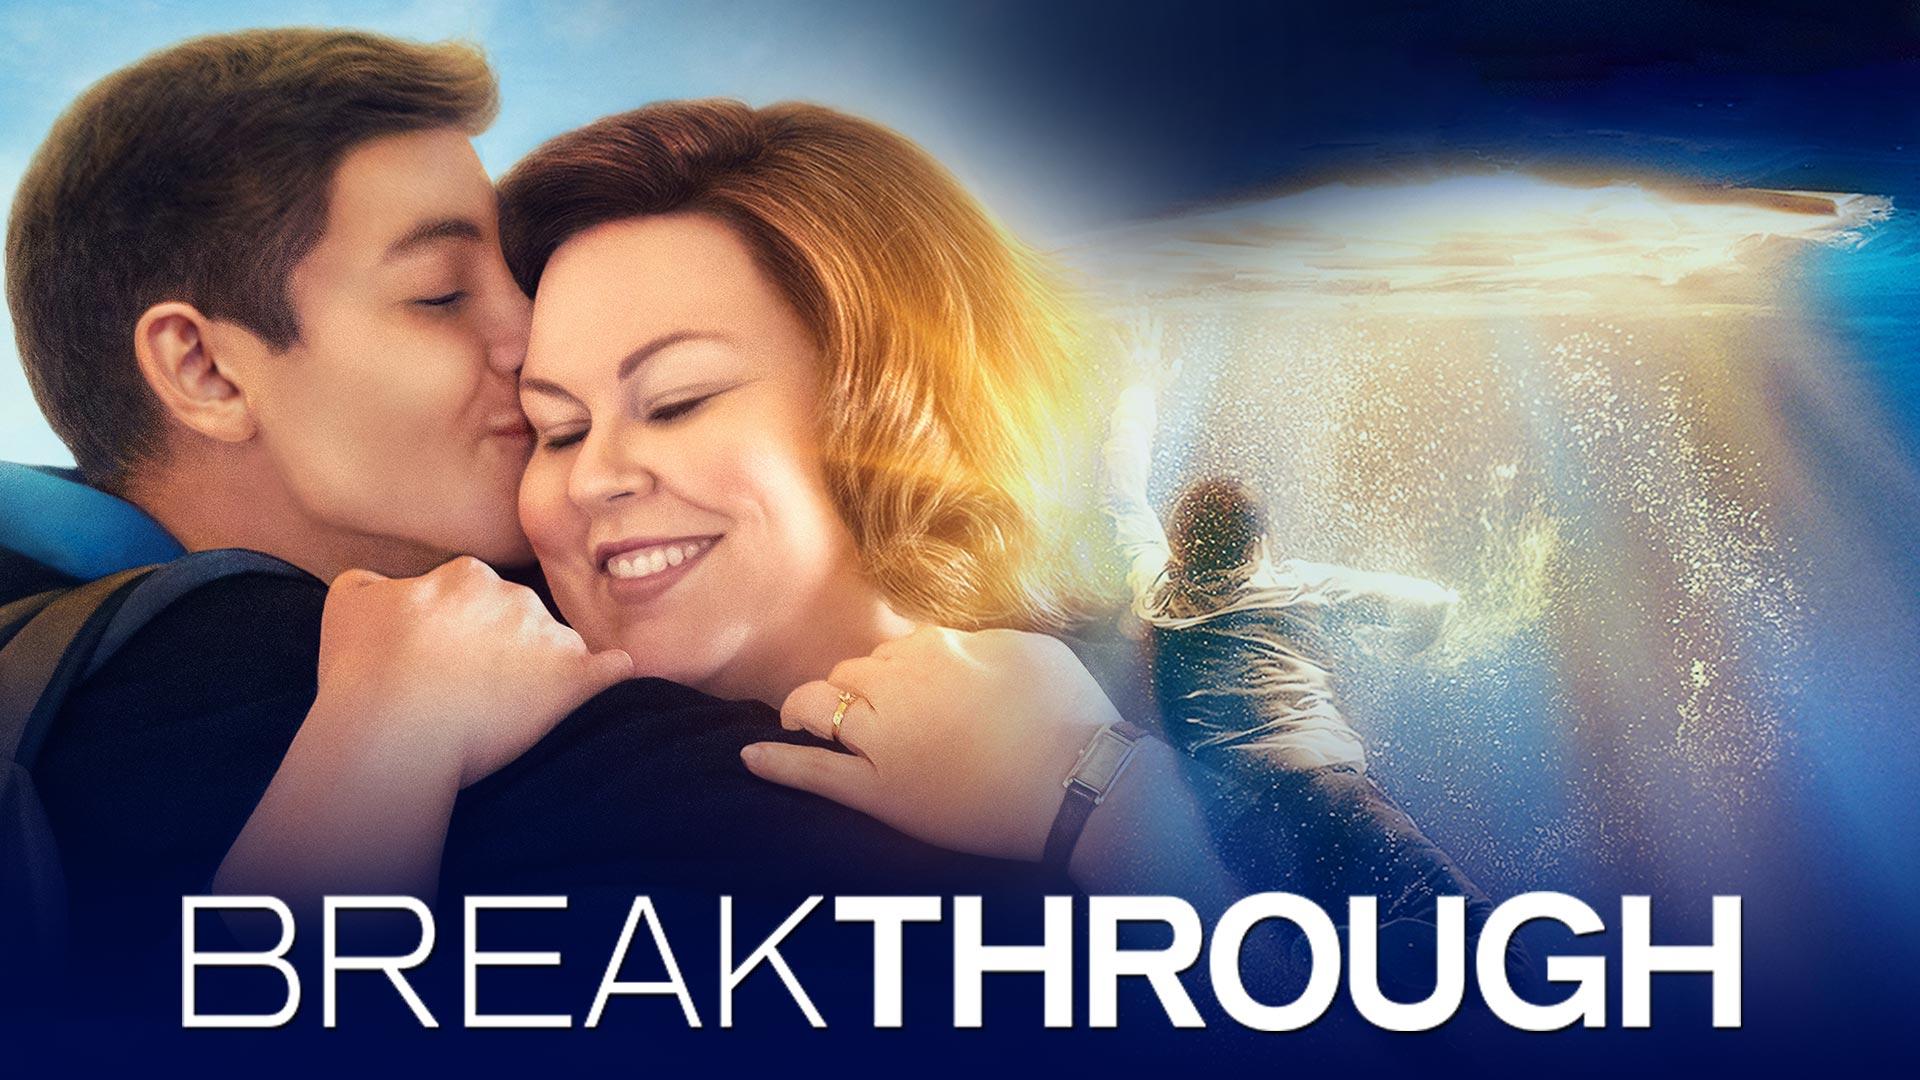 Breakthrough (4K UHD)